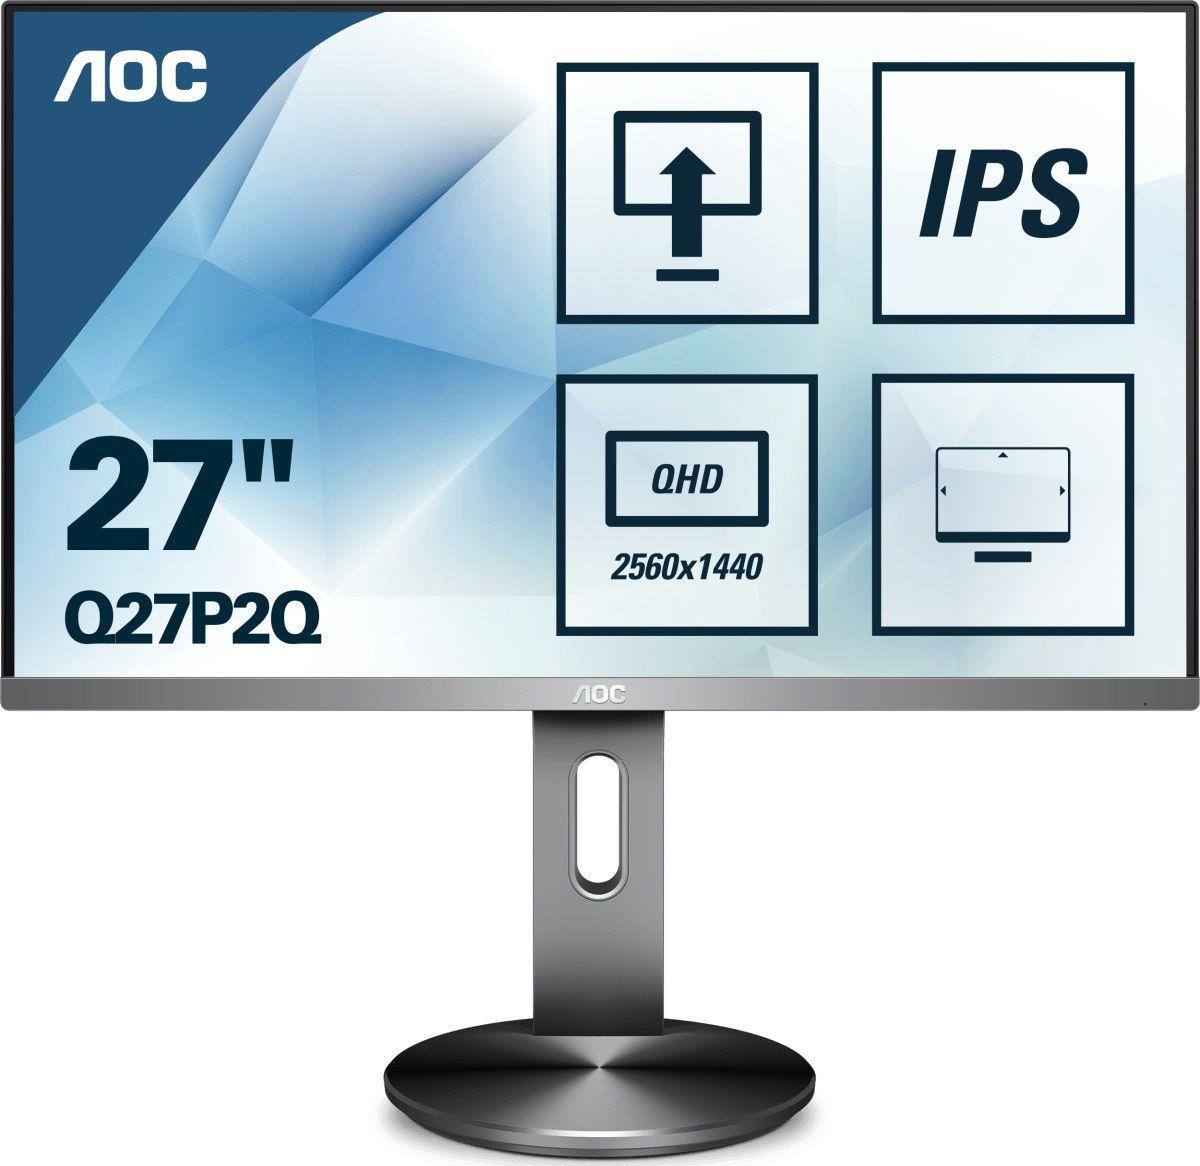 Monitor AOC 27 cal  Q27P2Q VGA DVI HDMI DP 4xUSB 3.1 głośniki